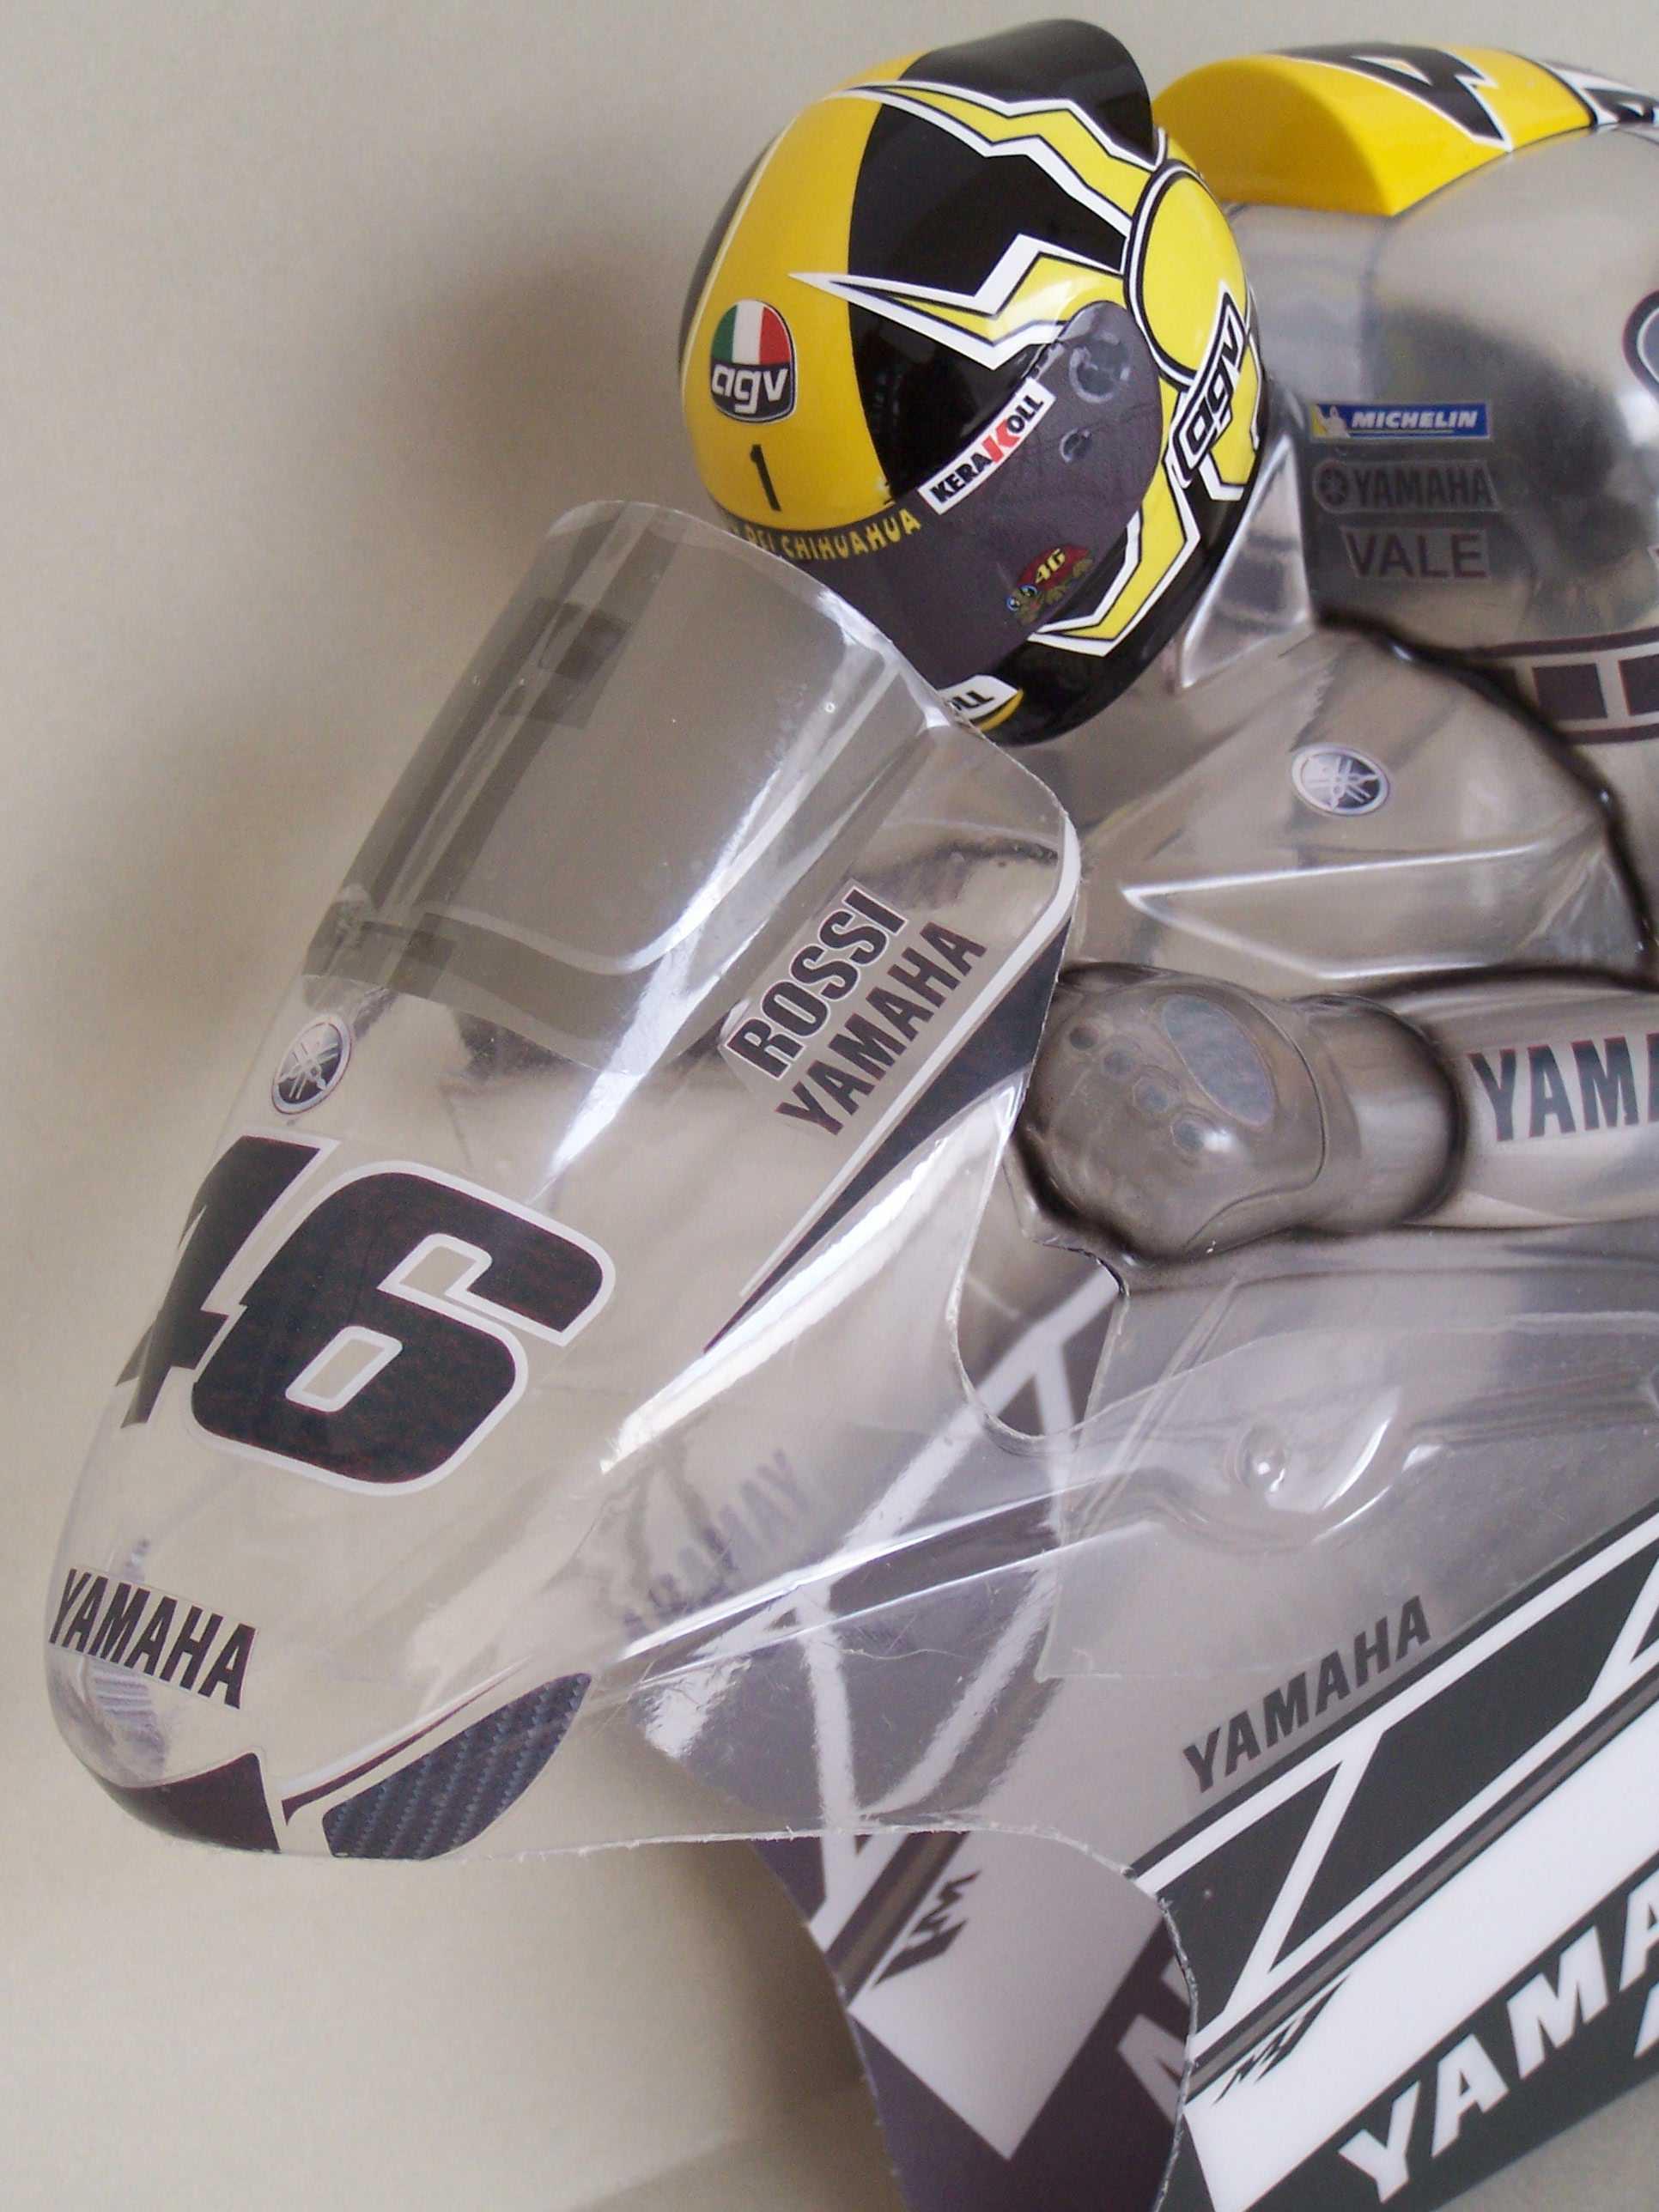 [Yamaha-Rossi-Laguna-Seca-2005-2.jpg]